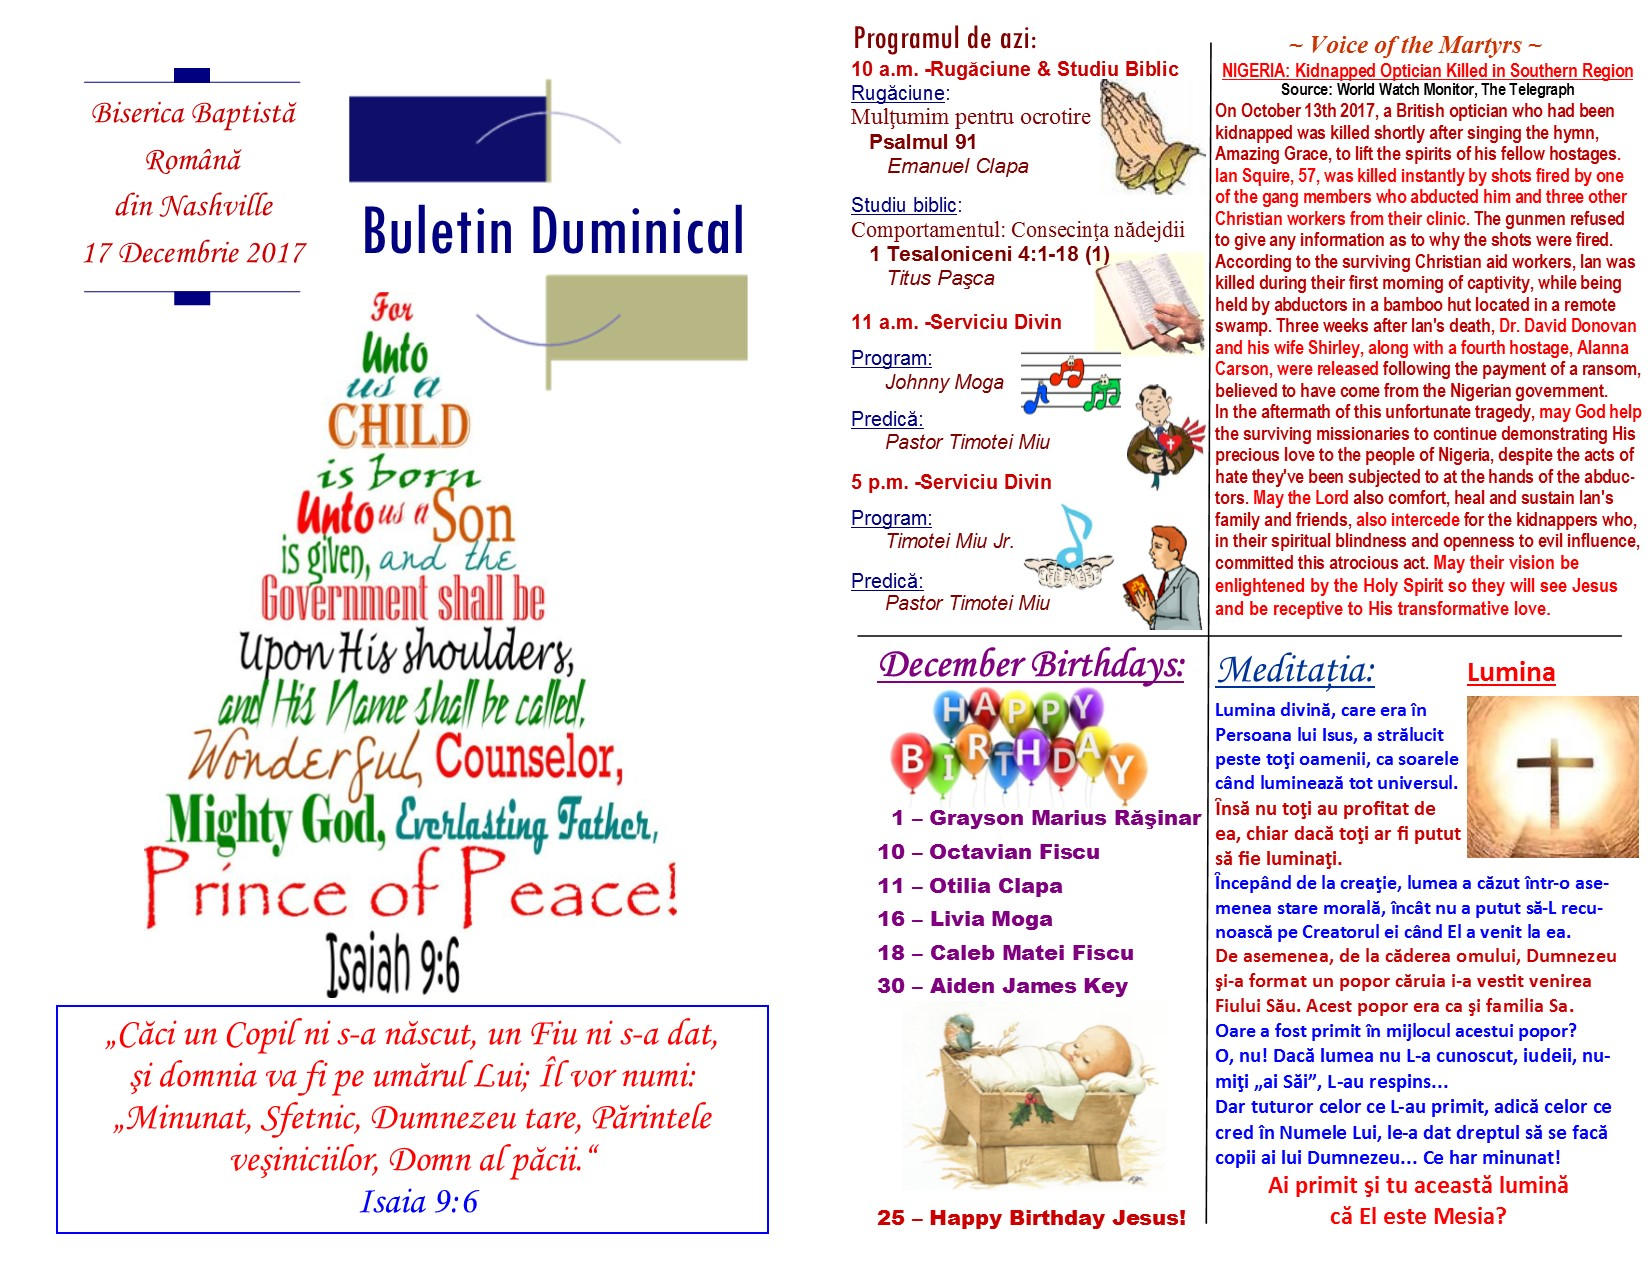 Buletin 12-17-17 page 1 & 2